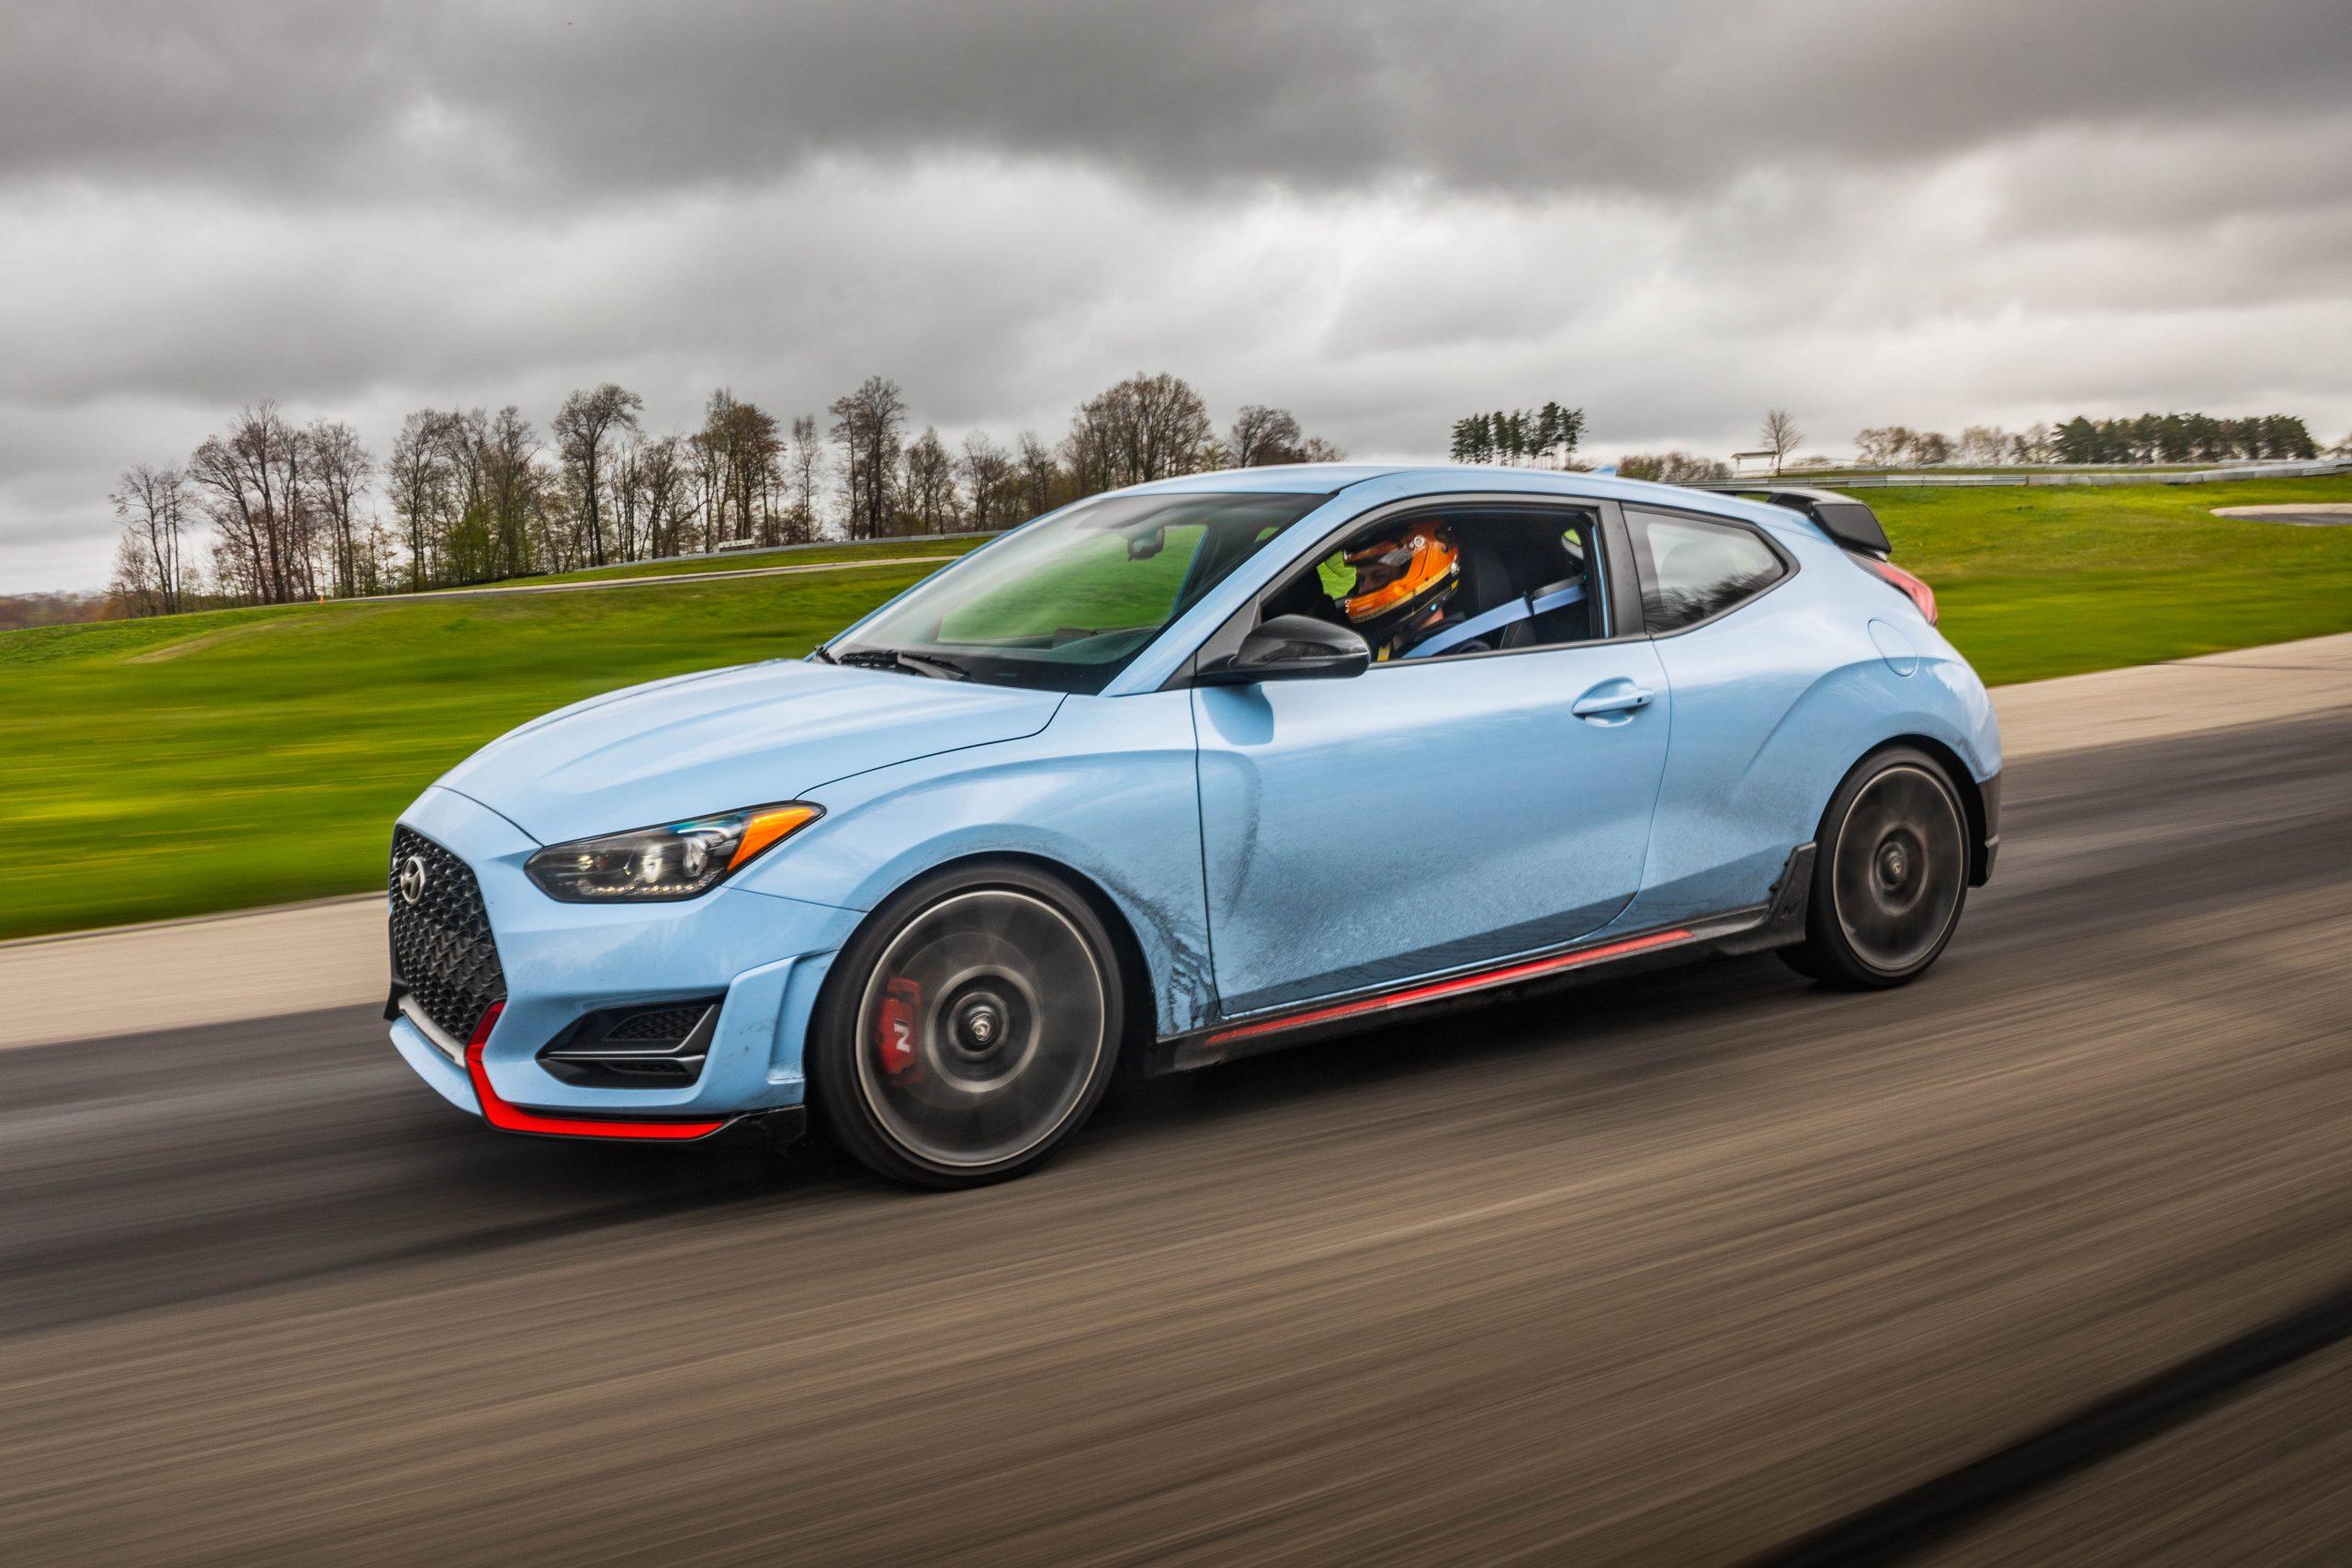 2020 Hyundai Veloster N track profile